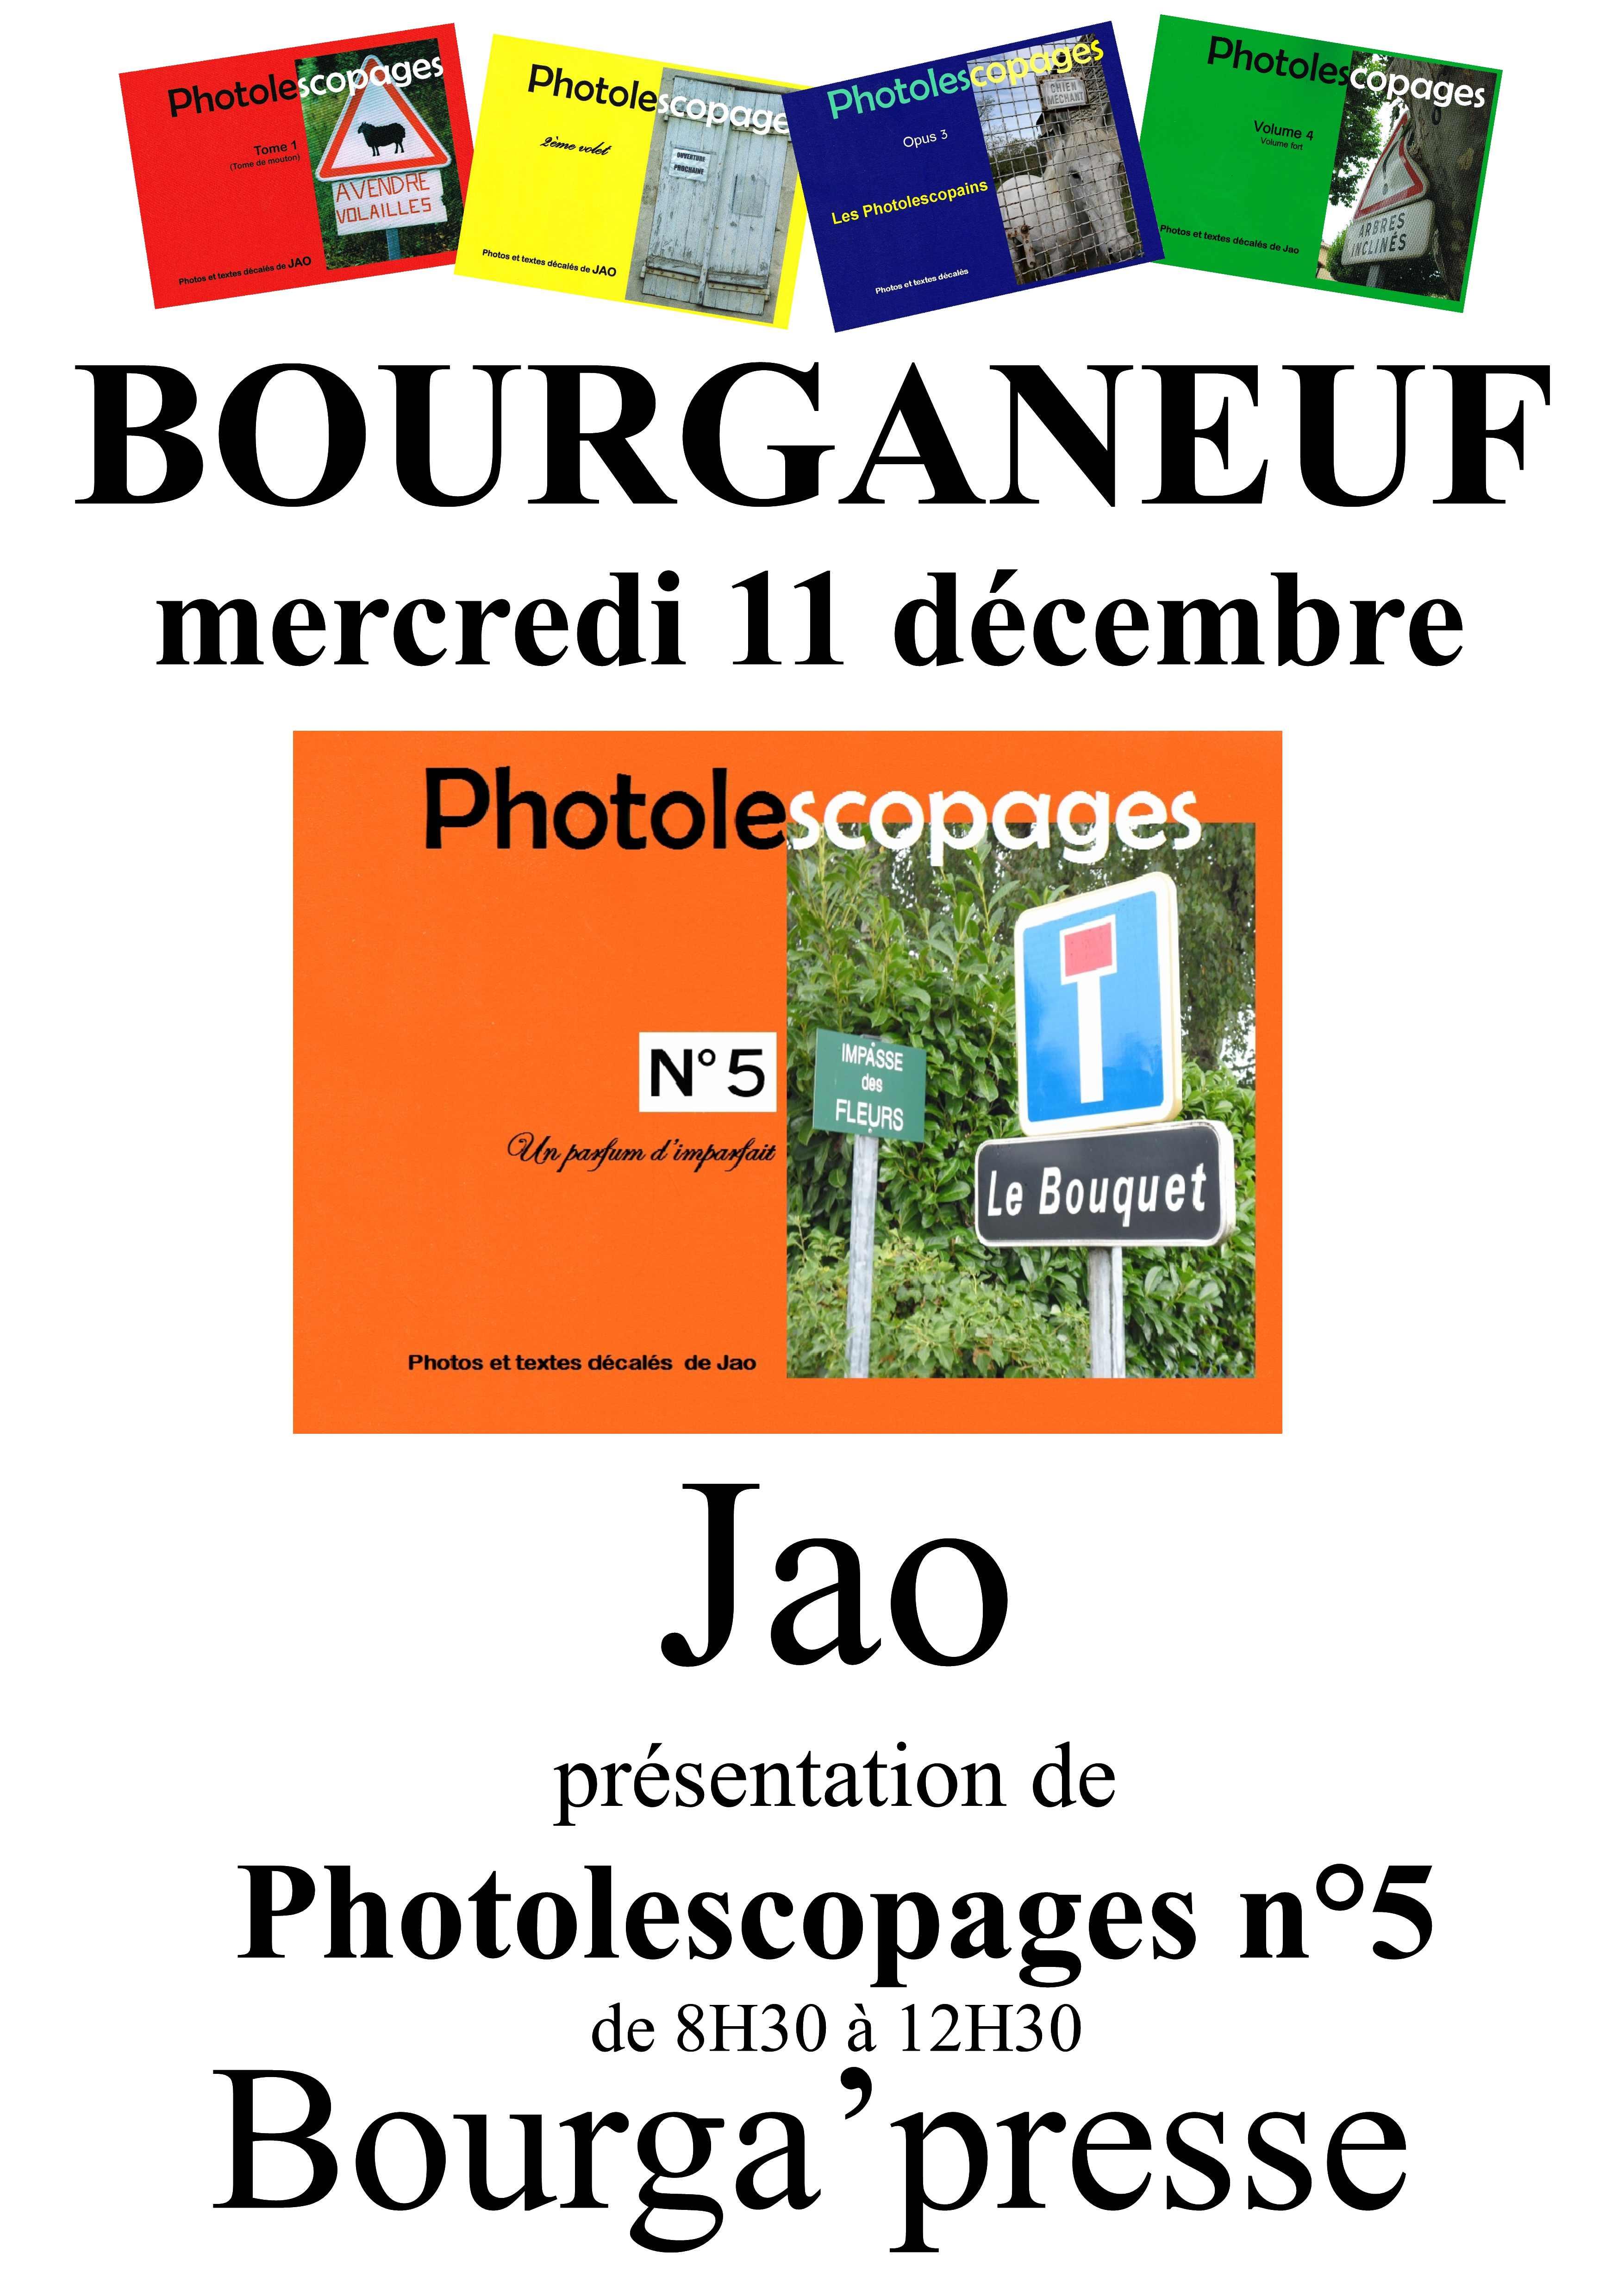 Bourganeuf (23) – Mercredi 11 décembre 2019